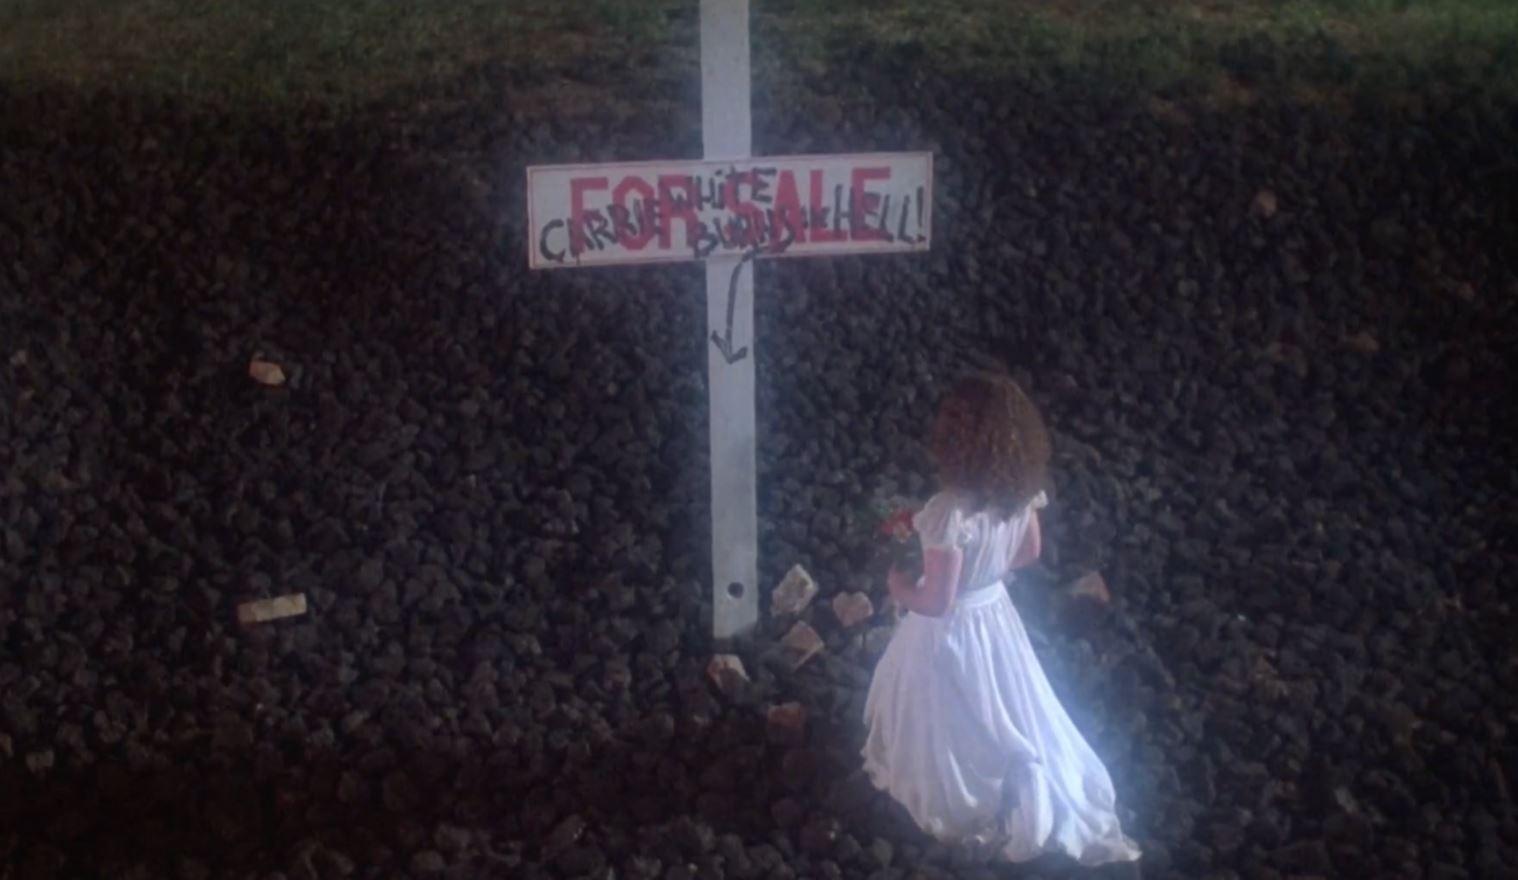 Carrie Grave Ending